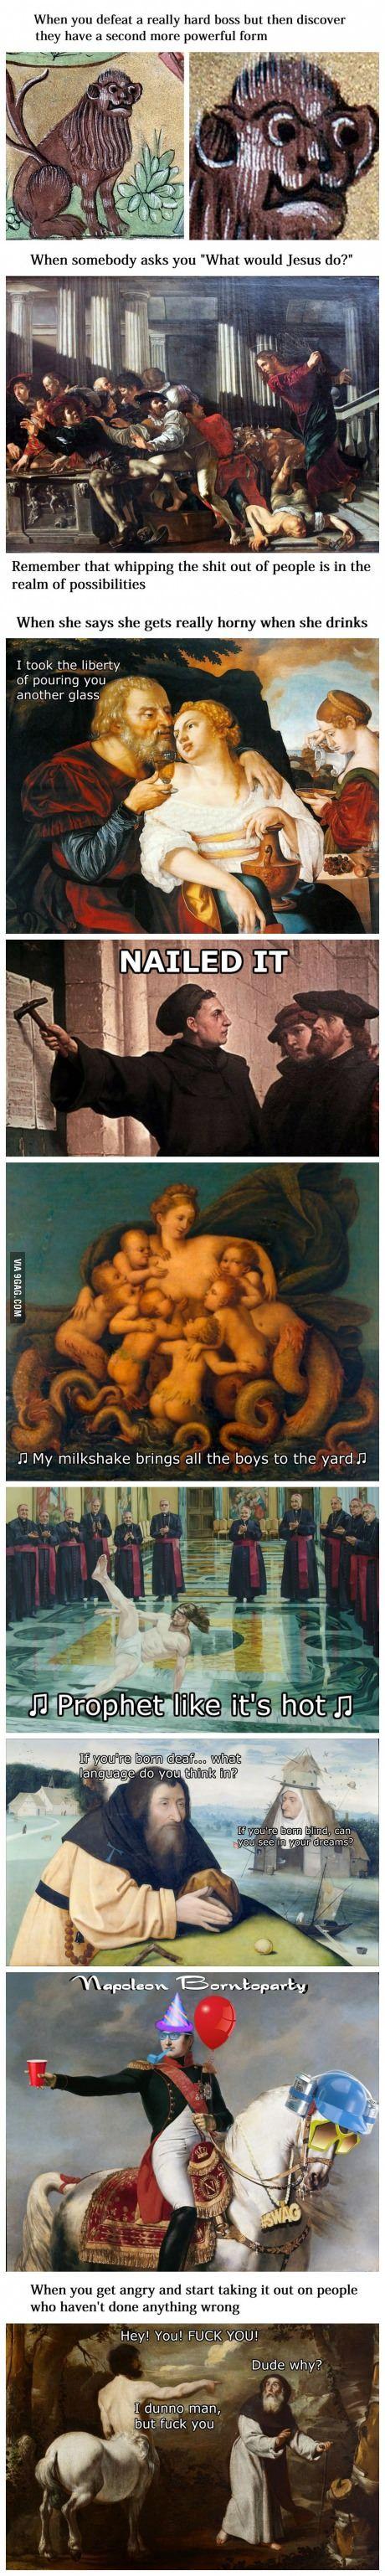 Classical Art Memes Latest (Part-4)